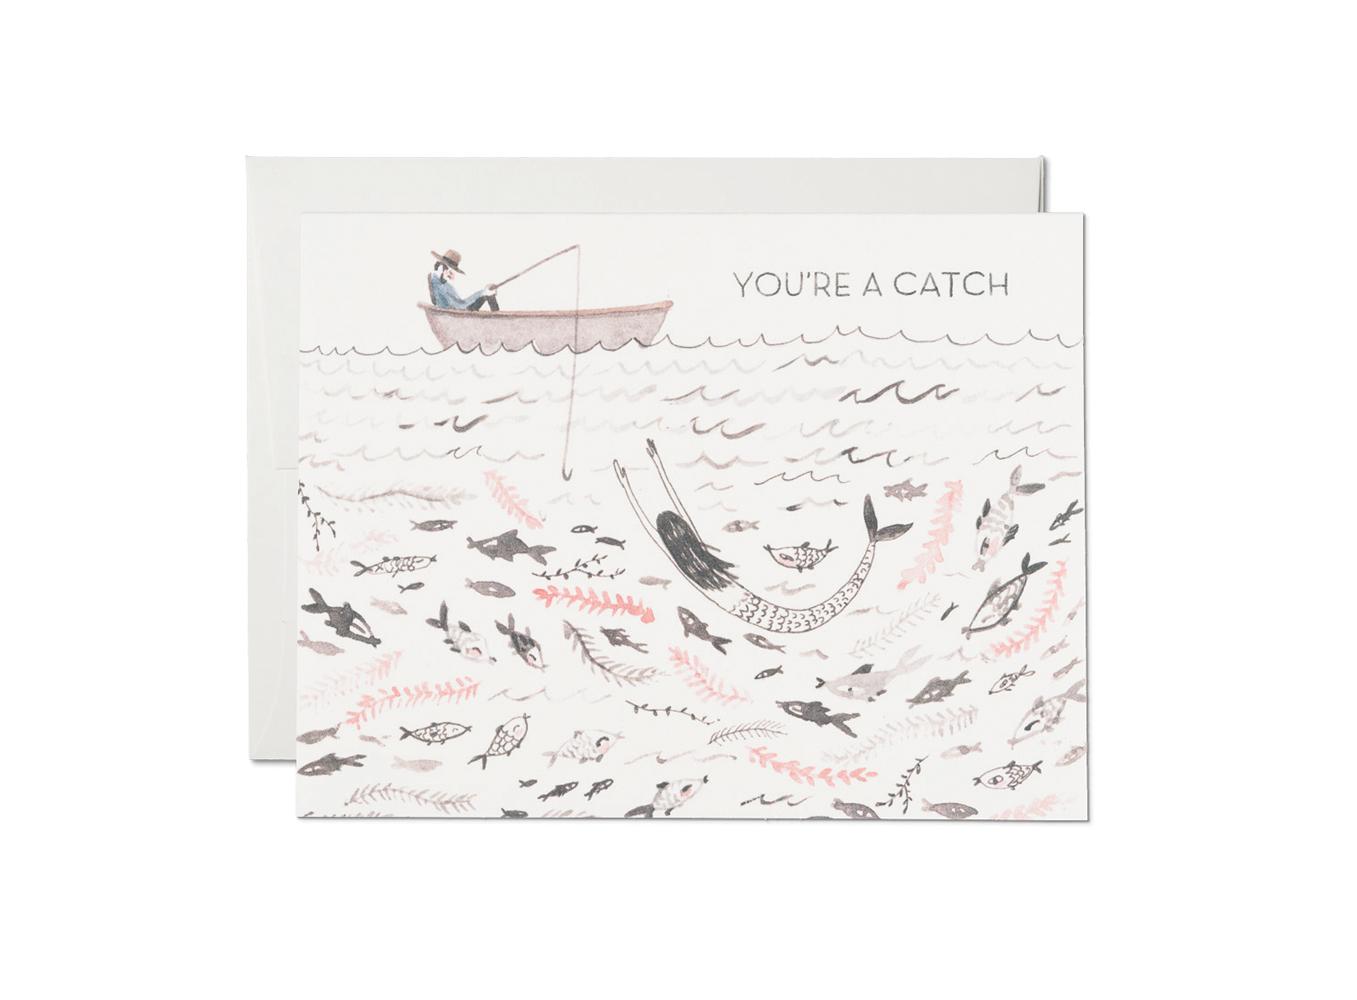 BUR1369-Youre-A-Catch